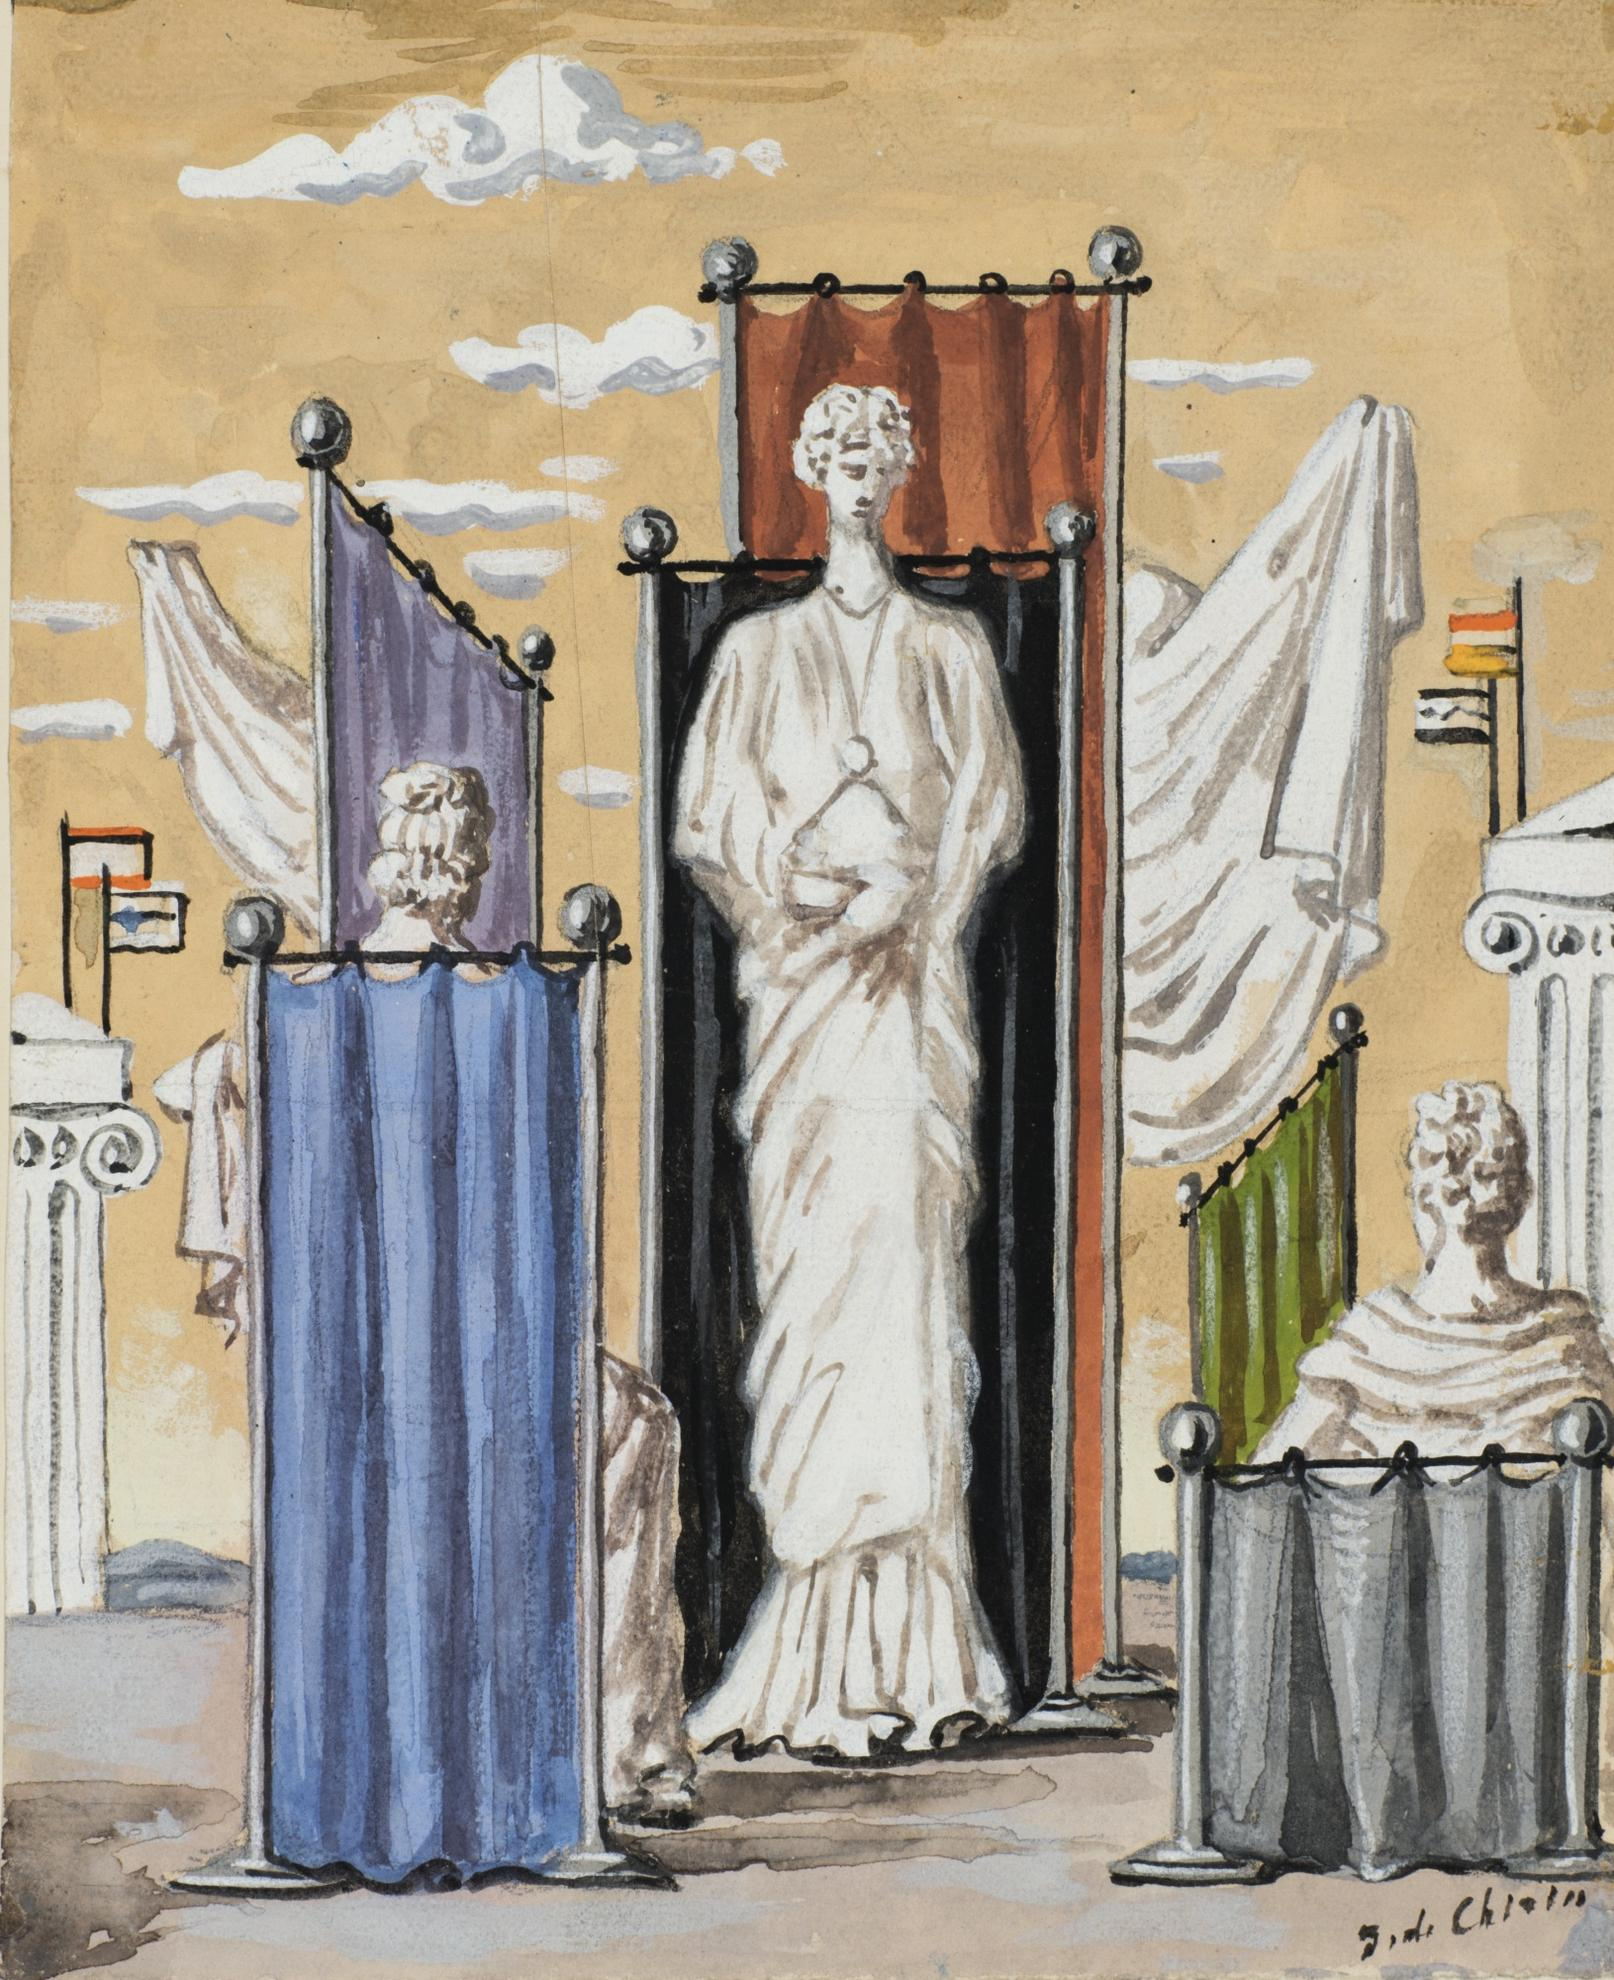 Giorgio de Chirico-La Femme Antique-1937